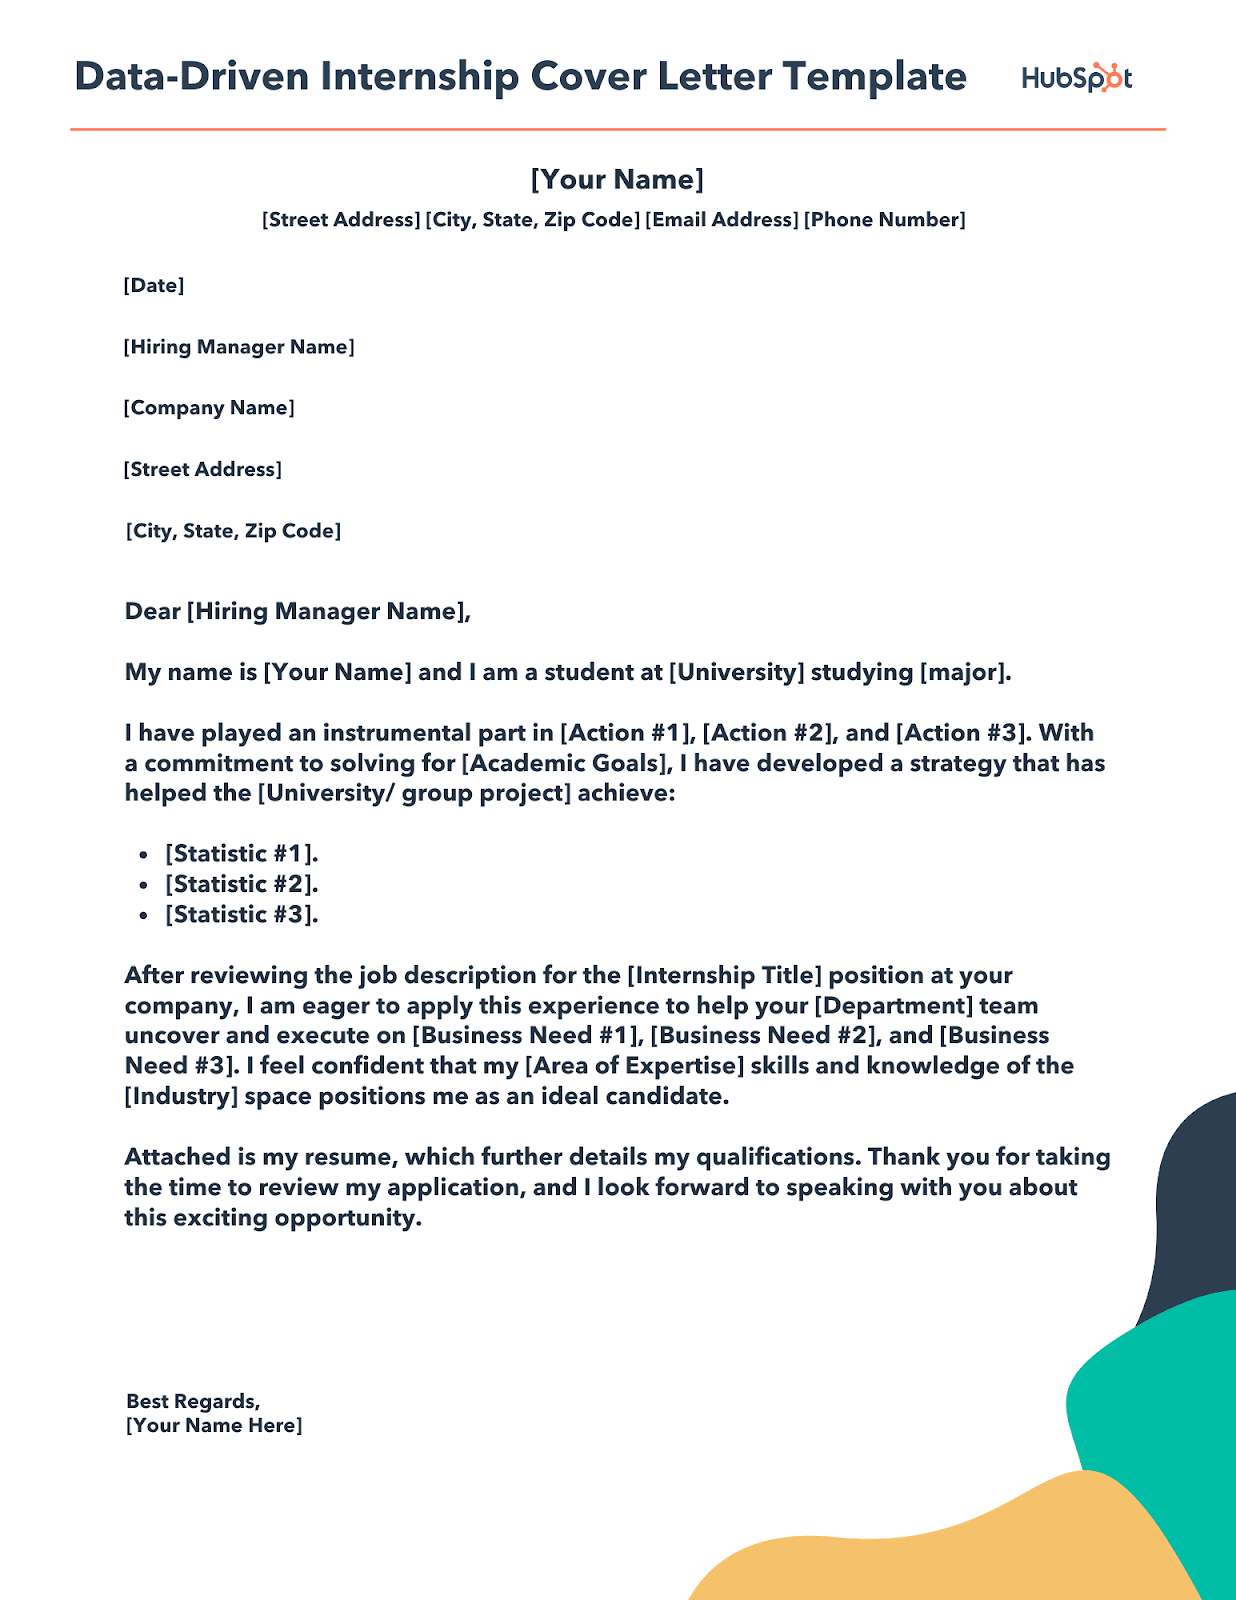 data-driven internship cover letter template